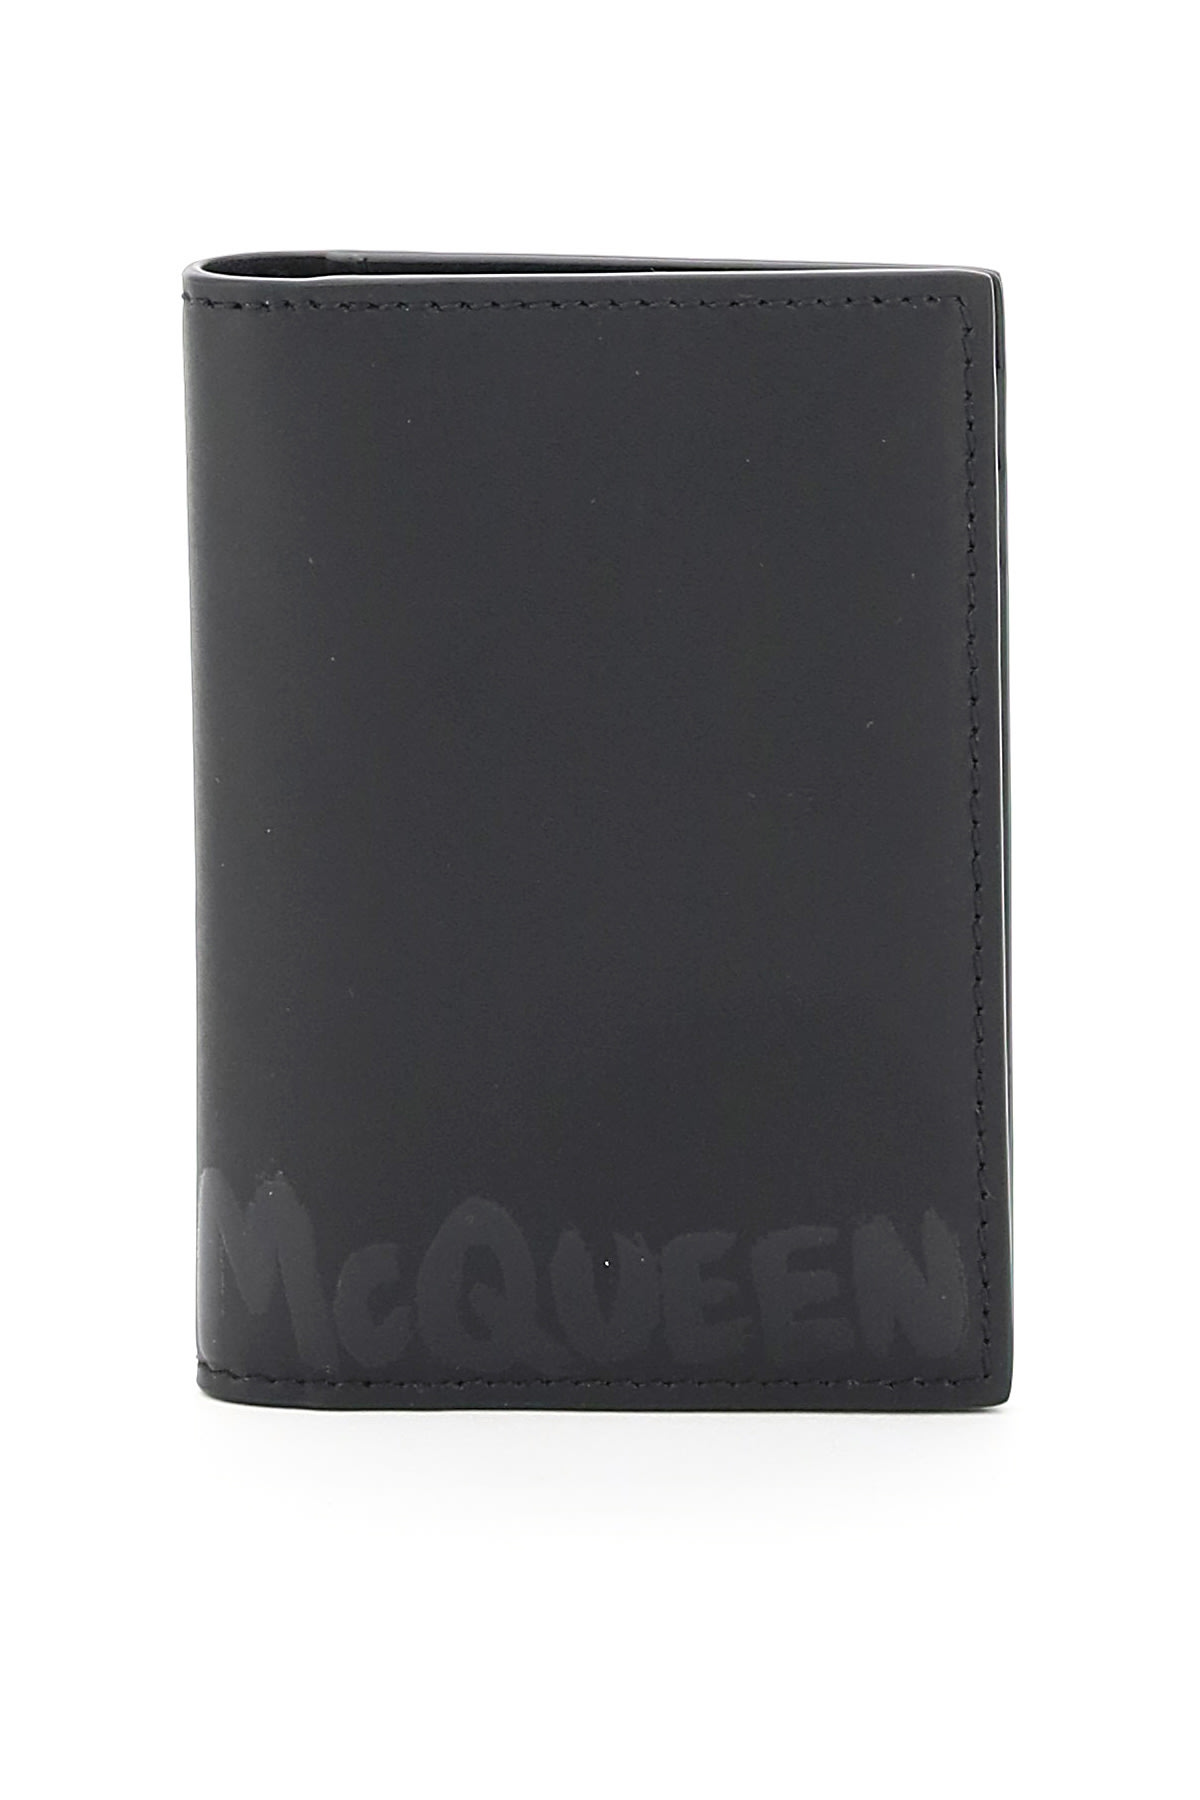 Alexander McQueen Graffiti Logo Bi-fold Card Holder